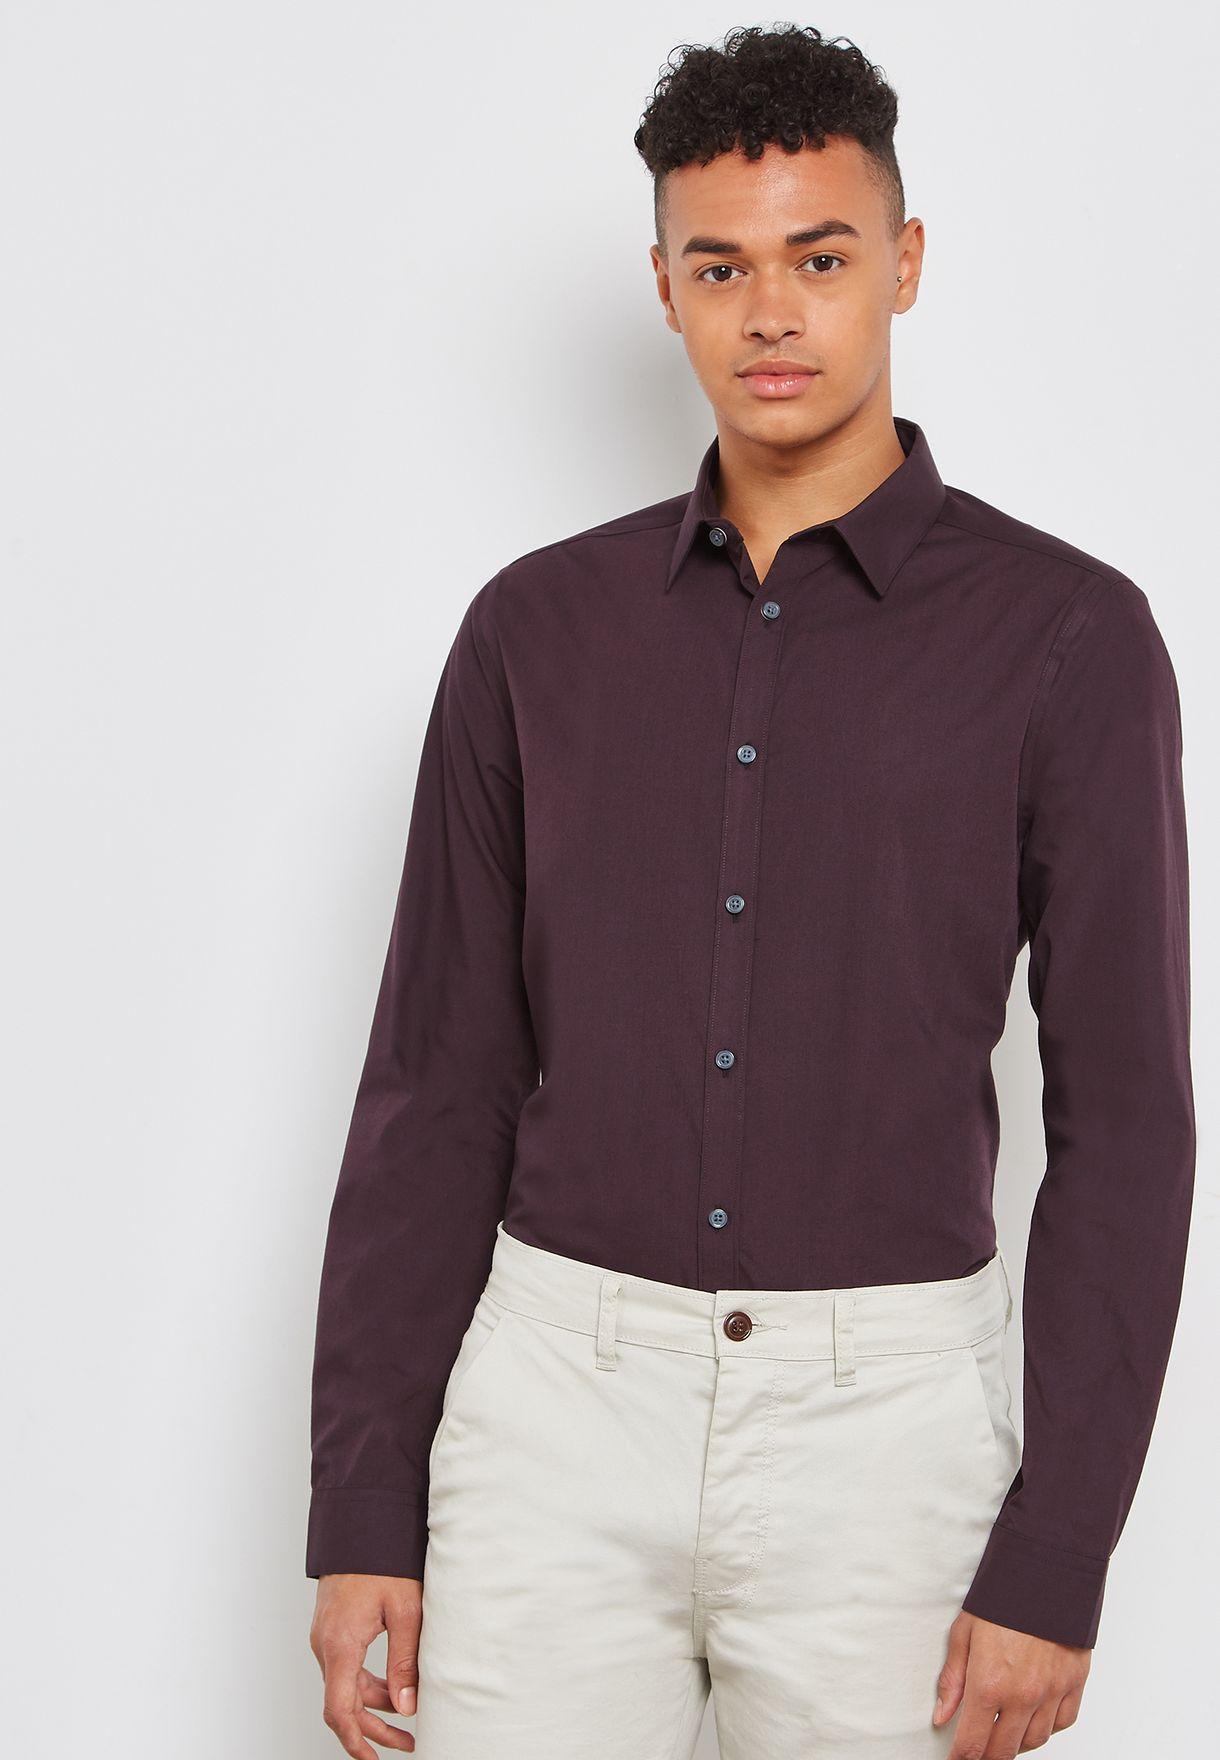 d663df7de47875 Shop New Look burgundy Slim Fit Poplin Shirt 5896411 for Men in UAE -  NE767AT01XYC